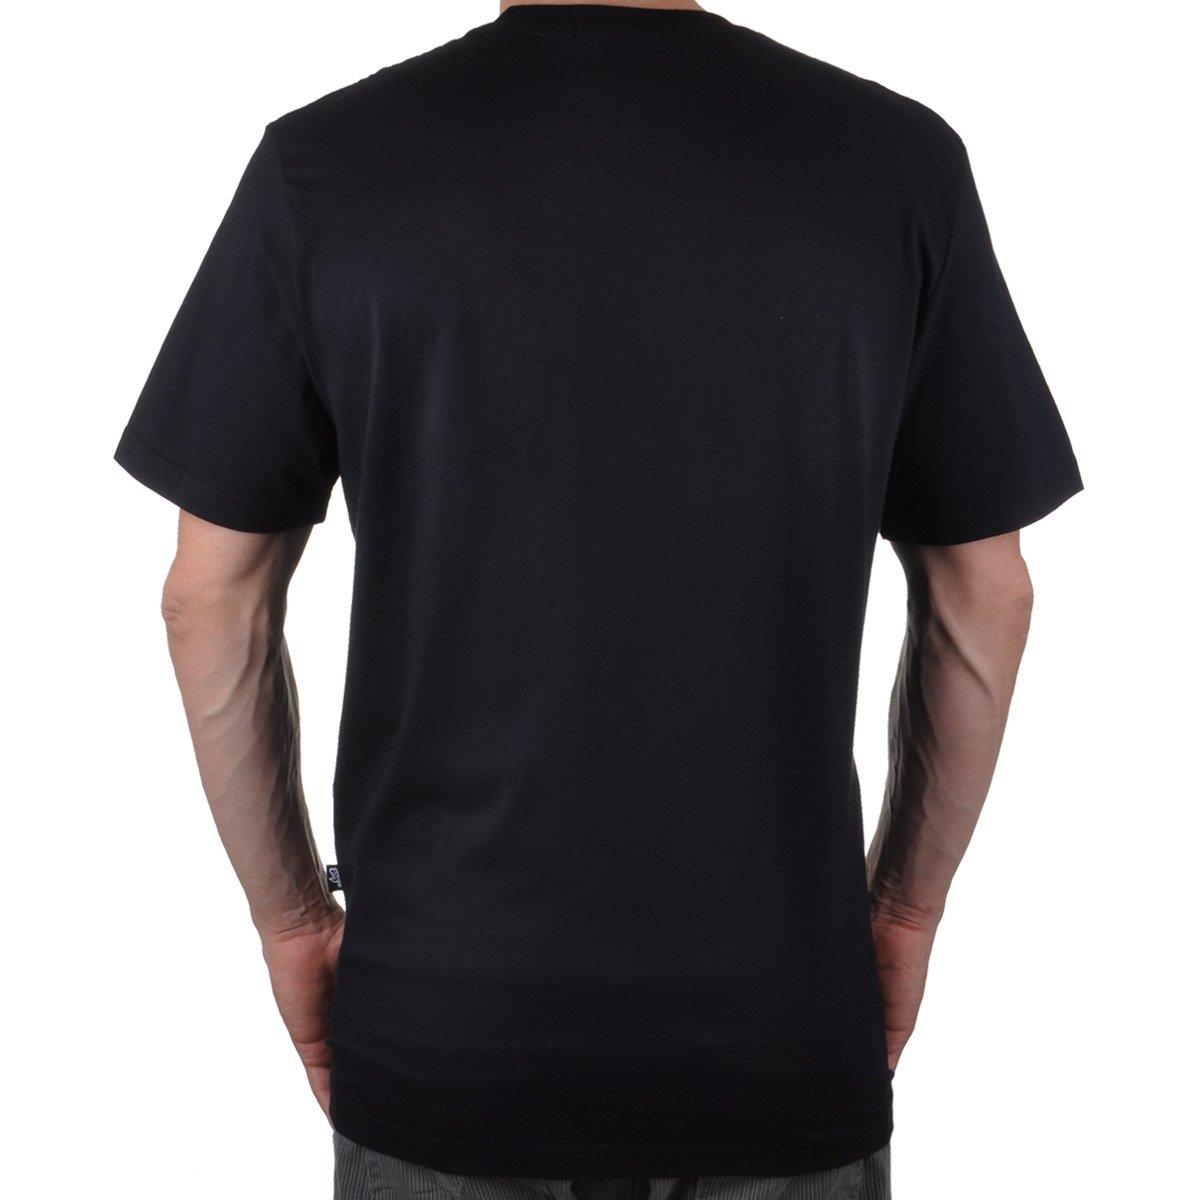 6965bb0a83 Camiseta Lost Lines Crosshatch Masculino  Camiseta Lost Lines Crosshatch  Masculino ...